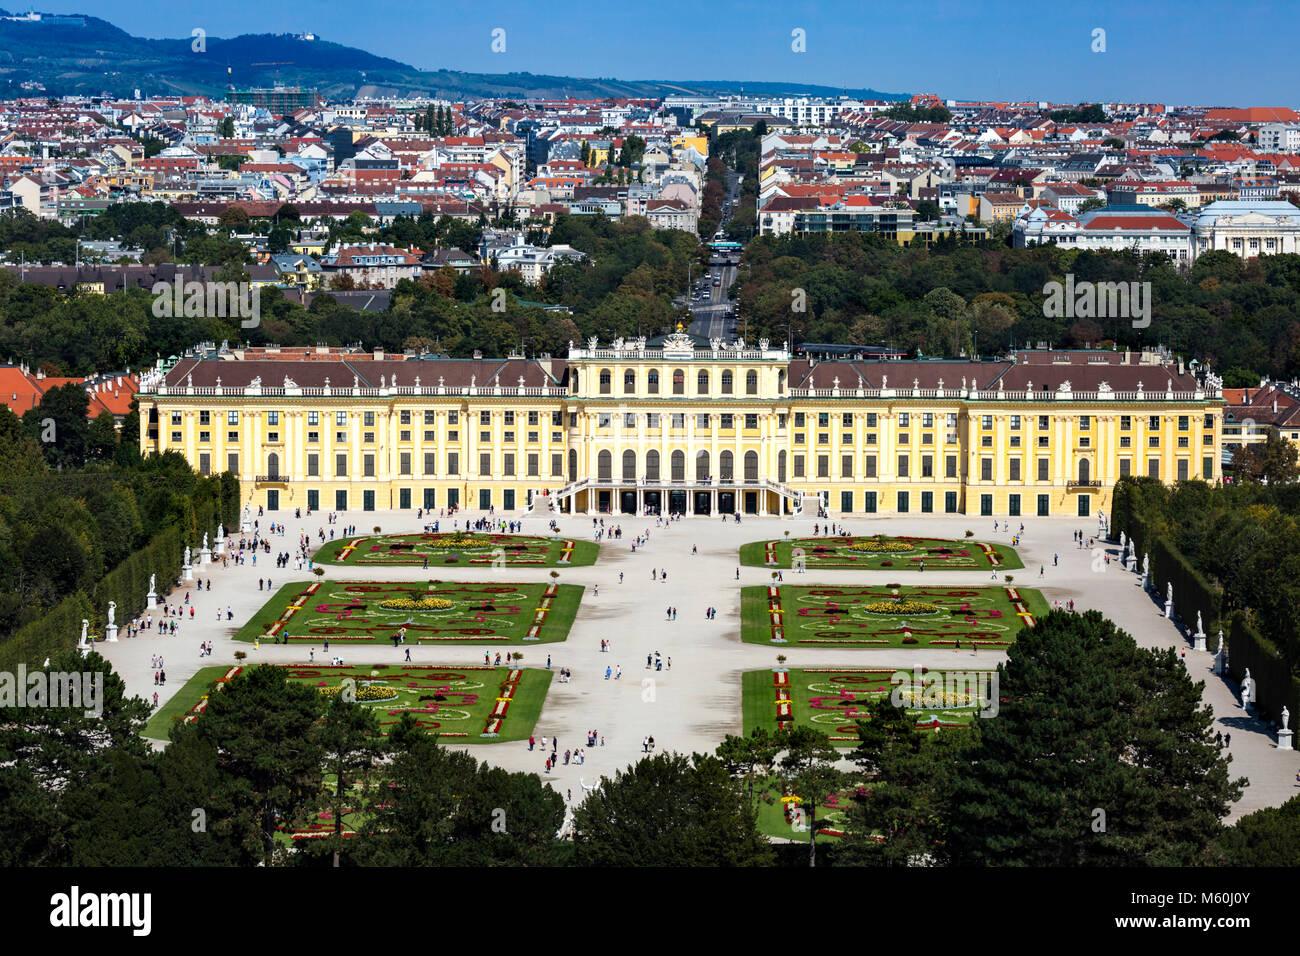 Looking down on Schönbrunn Palace gardens, Schonbrunn, Vienna, Austria. - Stock Image